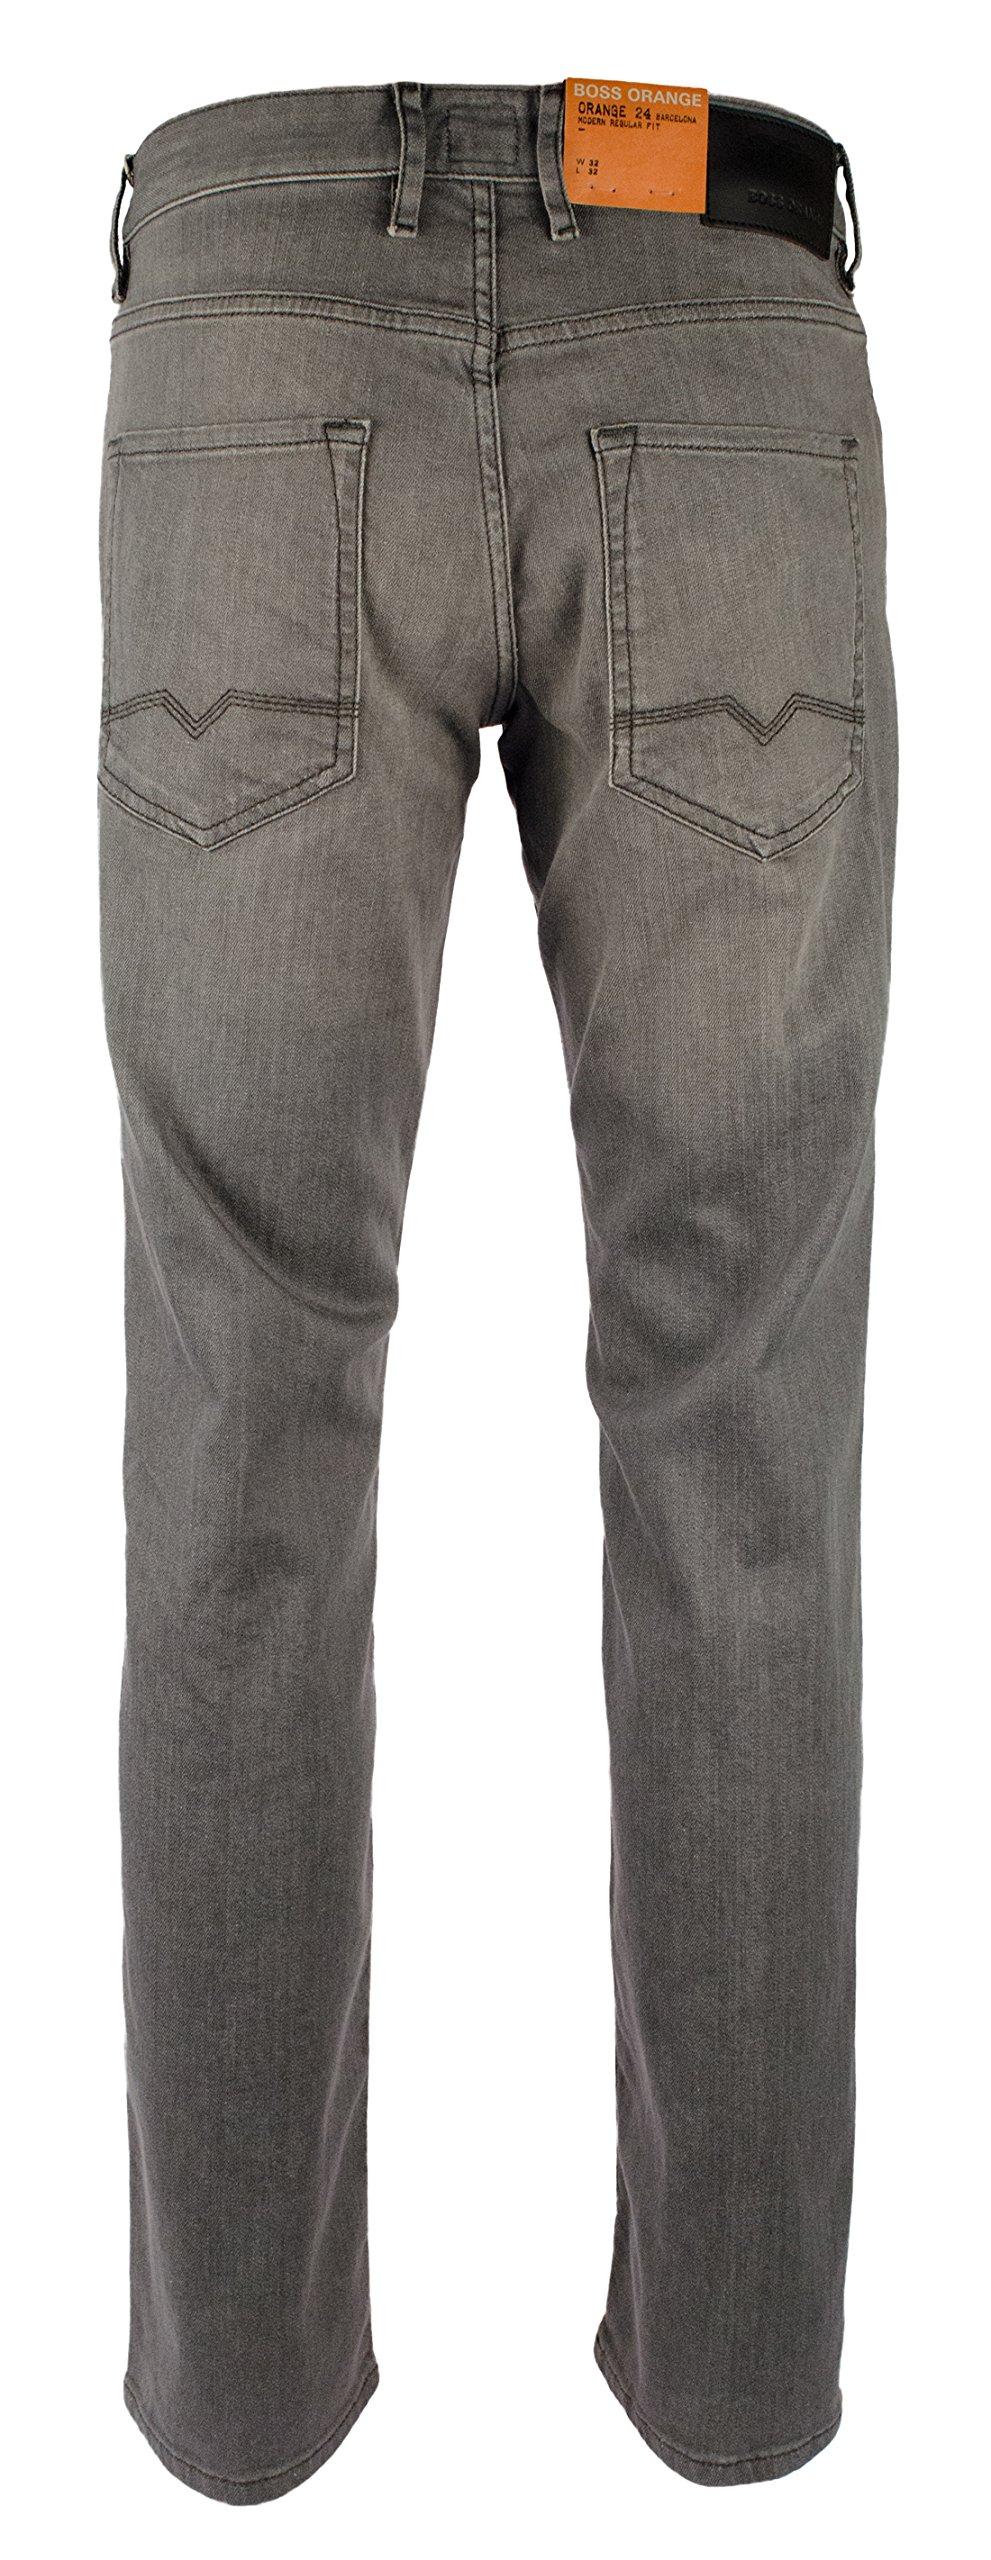 Hugo Boss Men's Barcelona Orange Label Modern Regular Fit Jeans-G-36Wx32L by HUGO BOSS (Image #2)